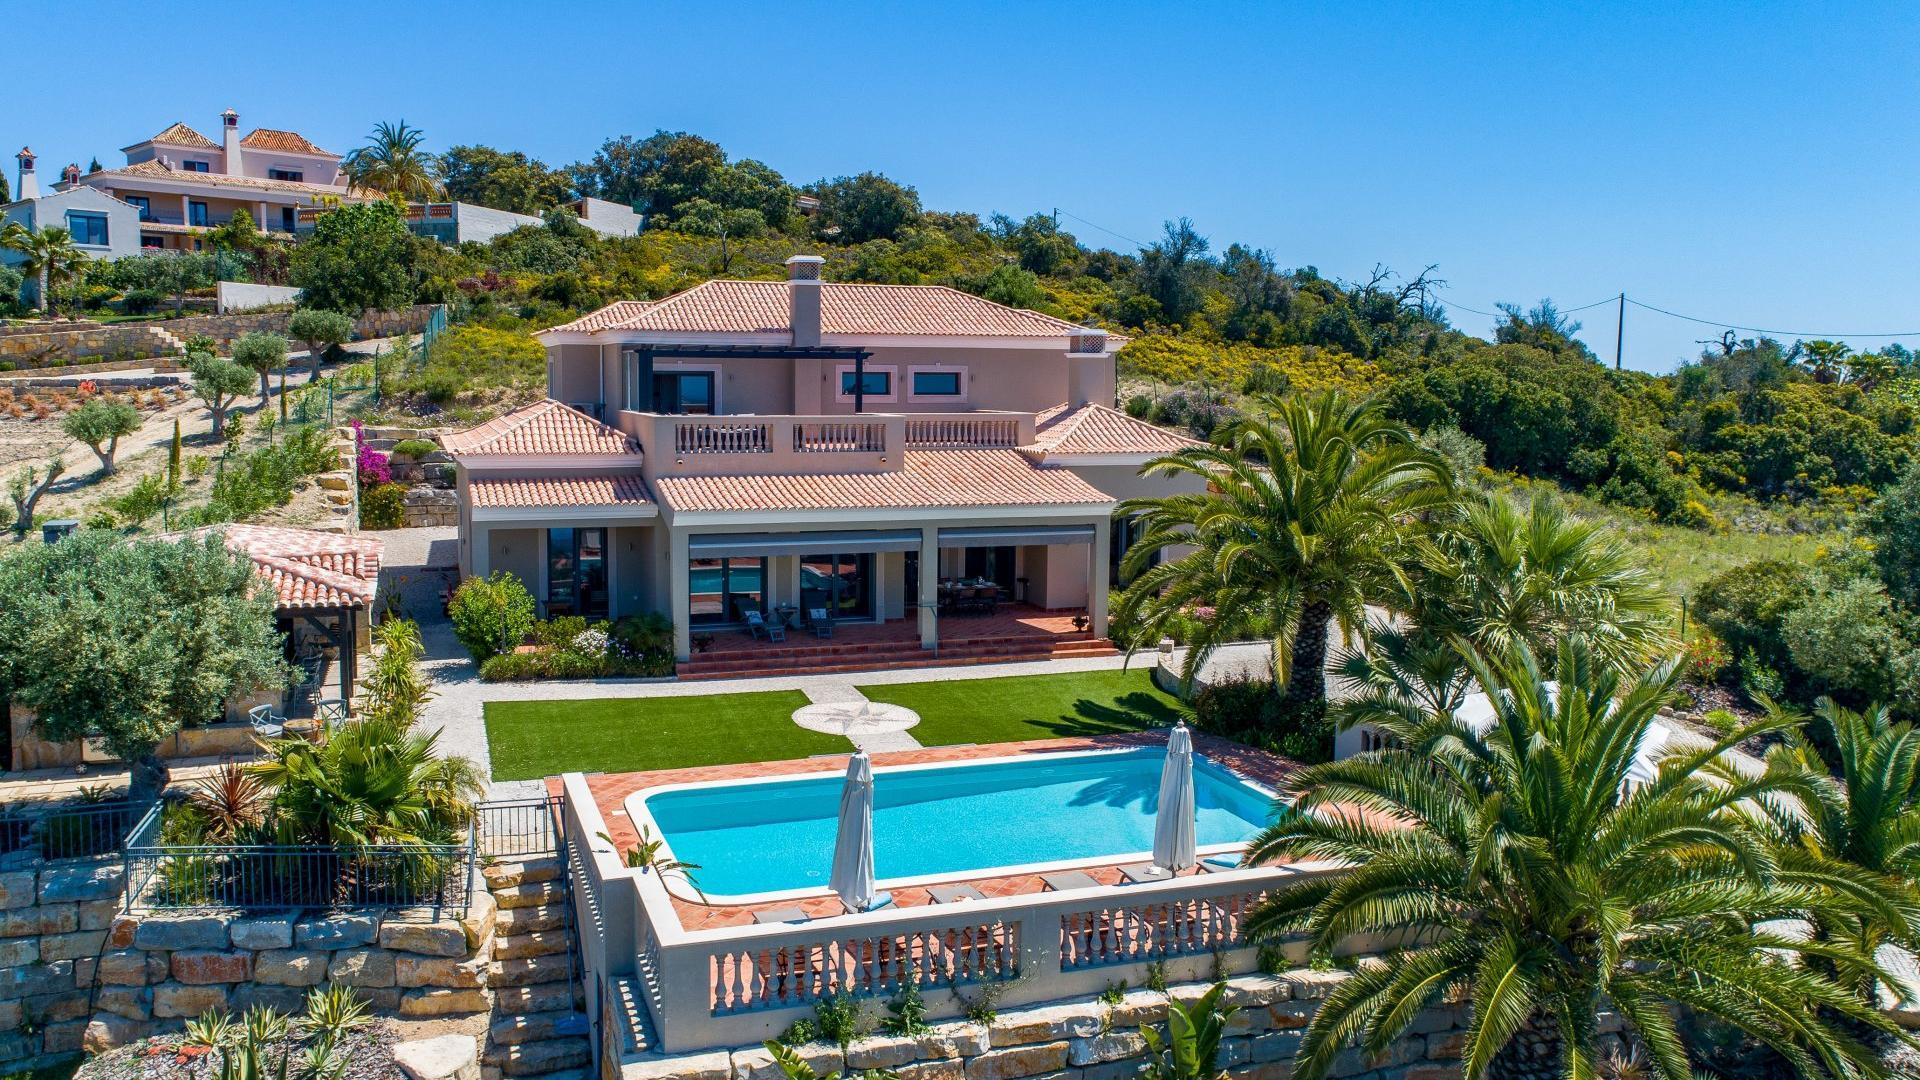 Casa Nexe - Santa Barbara de Nexe, Algarve - DJI_0584.jpg